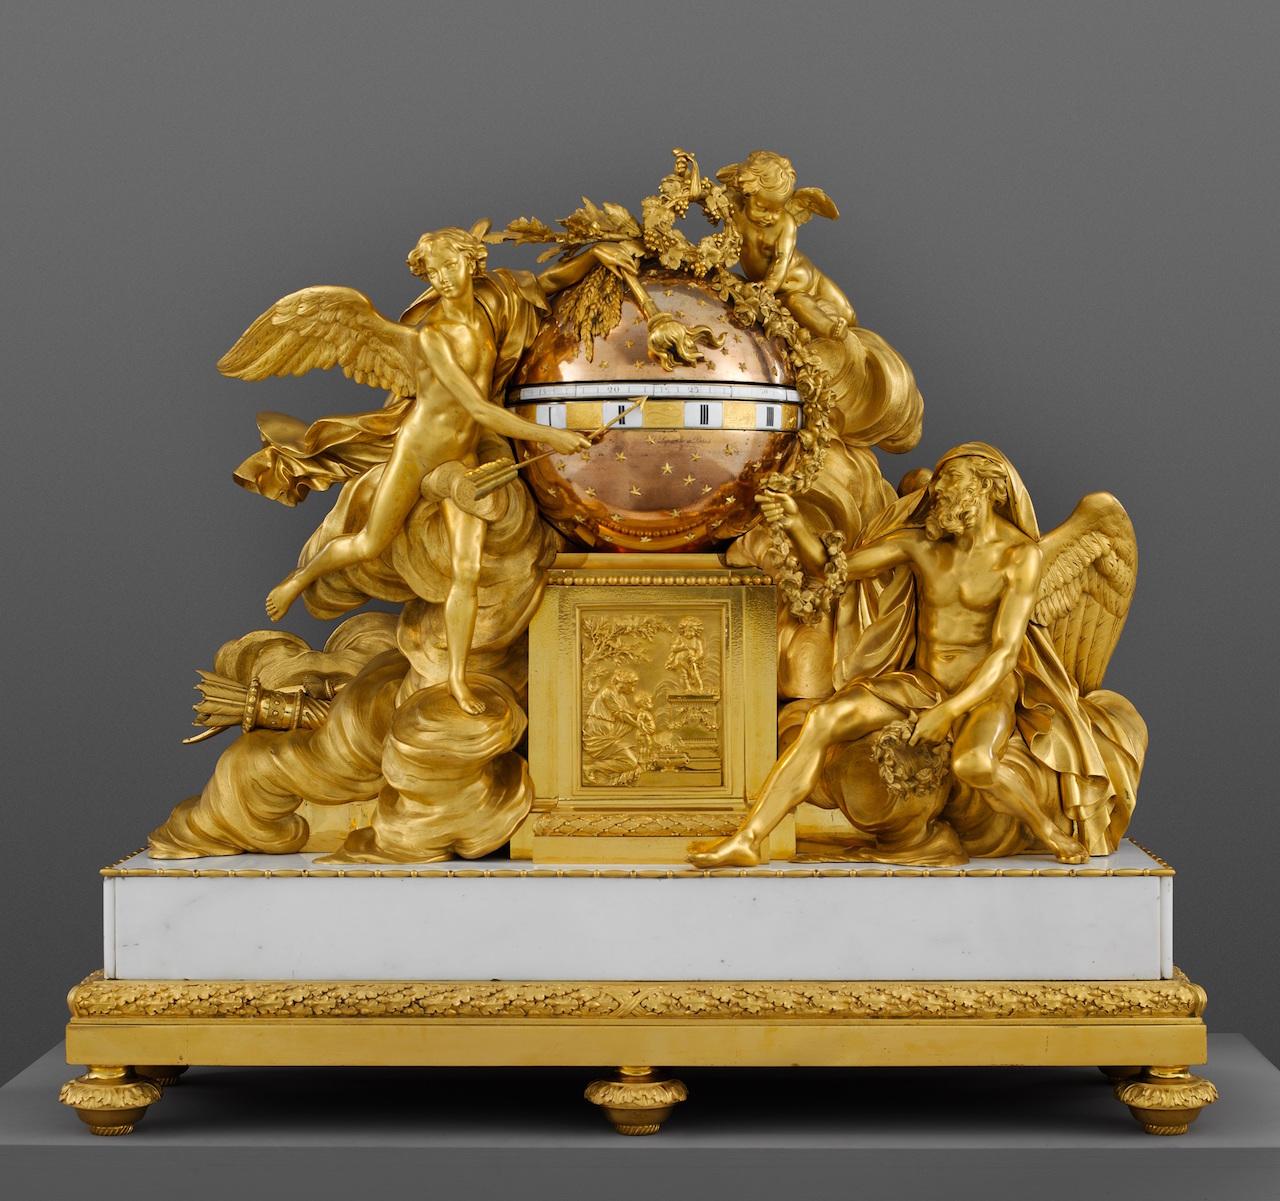 Mantel clock, Maker: Clockmaker: Jean-Baptiste Lepaute (French, 1727–1802) Modeler: Figures modeled by Augustin Pajou (French, Paris 1730–1809 Paris) Founder: Figures cast by Étienne Martincourt (French, active 1762–1800) Ca. 1780–90 Medium: Gilt bronze, marble, enamel Dimensions: Overall (Wt. confirmed): 37 x 41 x 12 1/2 in., 379lb. (94 x 104.1 x 31.8 cm, 171.9133kg) The Metropolitan Museum of Art, Gift of J. Pierpont Morgan, 1917